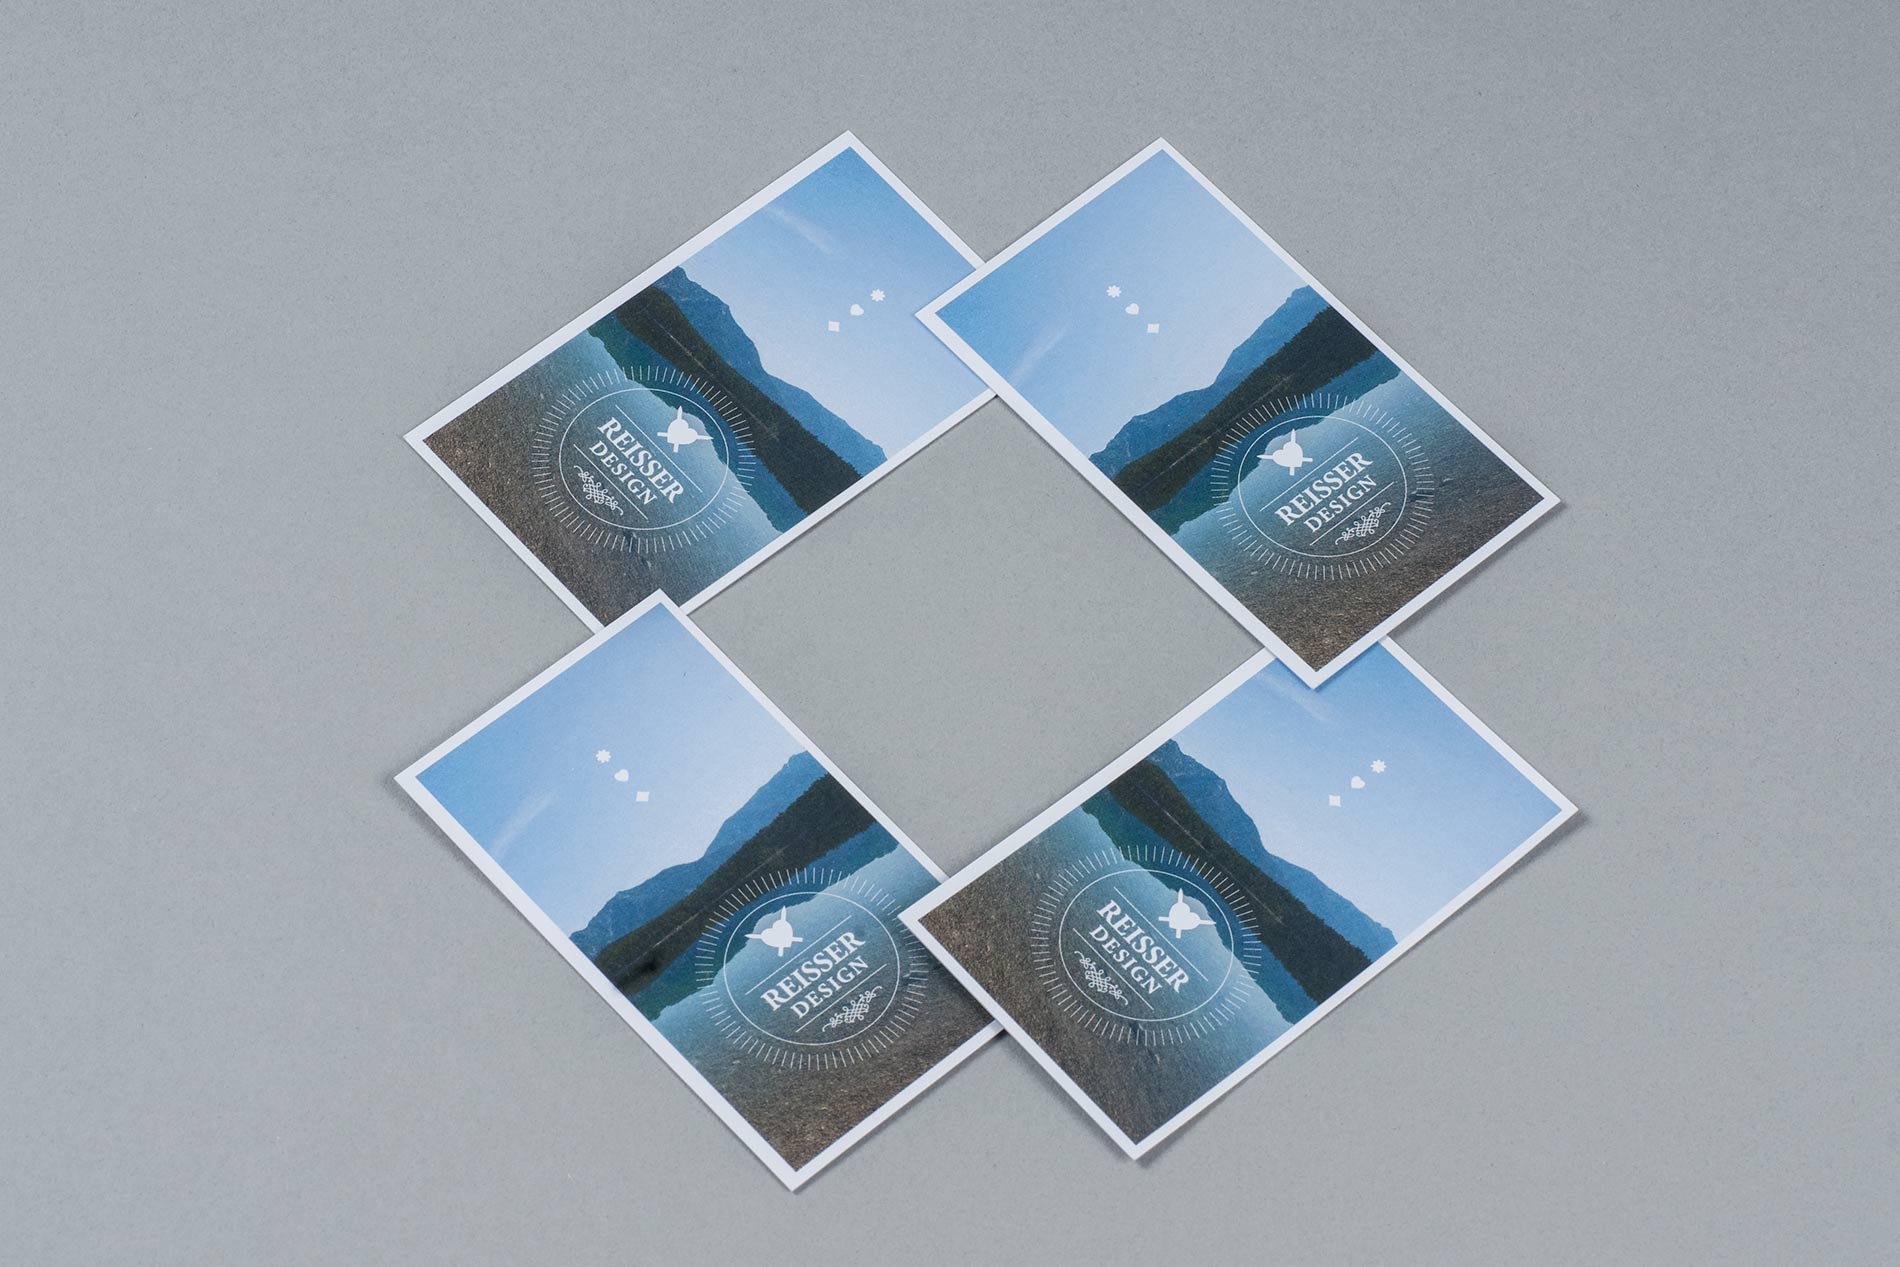 Janina-Lermer-Markengestaltung-Branddesign-Corporate-Design-Reisserdesign-Visitenkarten-Businesscards